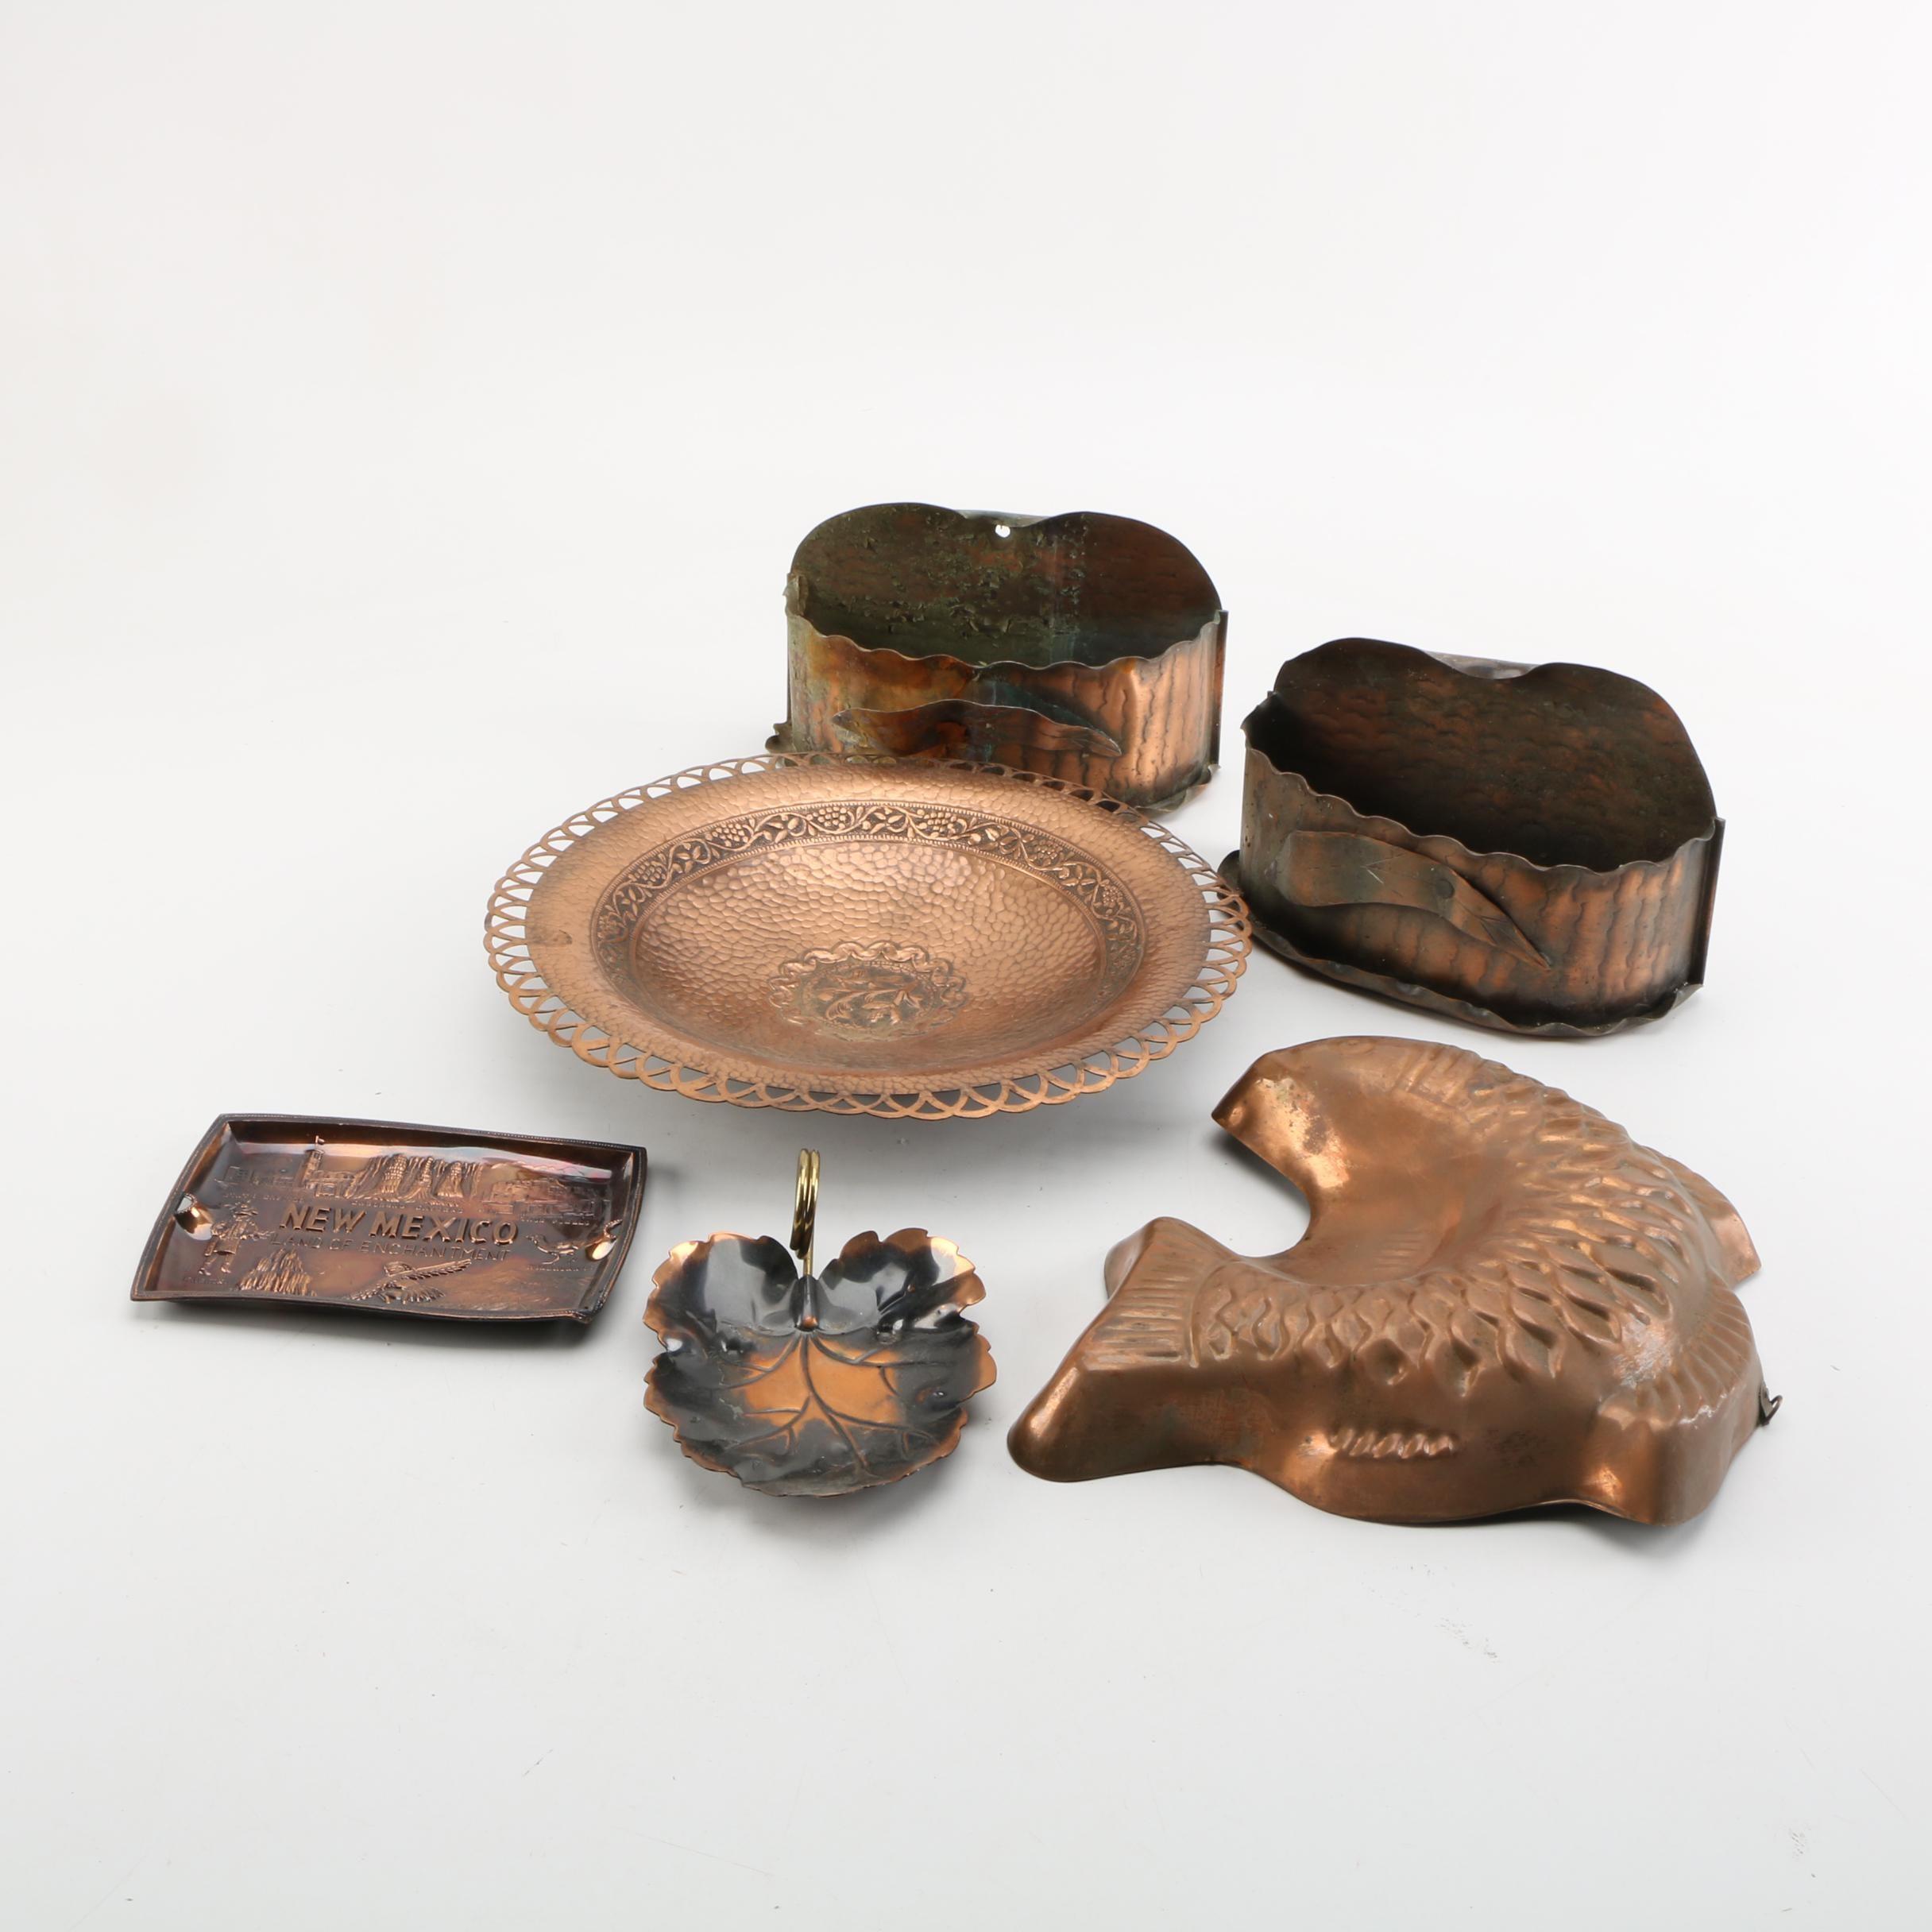 Copper Fish Baking Mold, Serveware and Kitchen Accessories